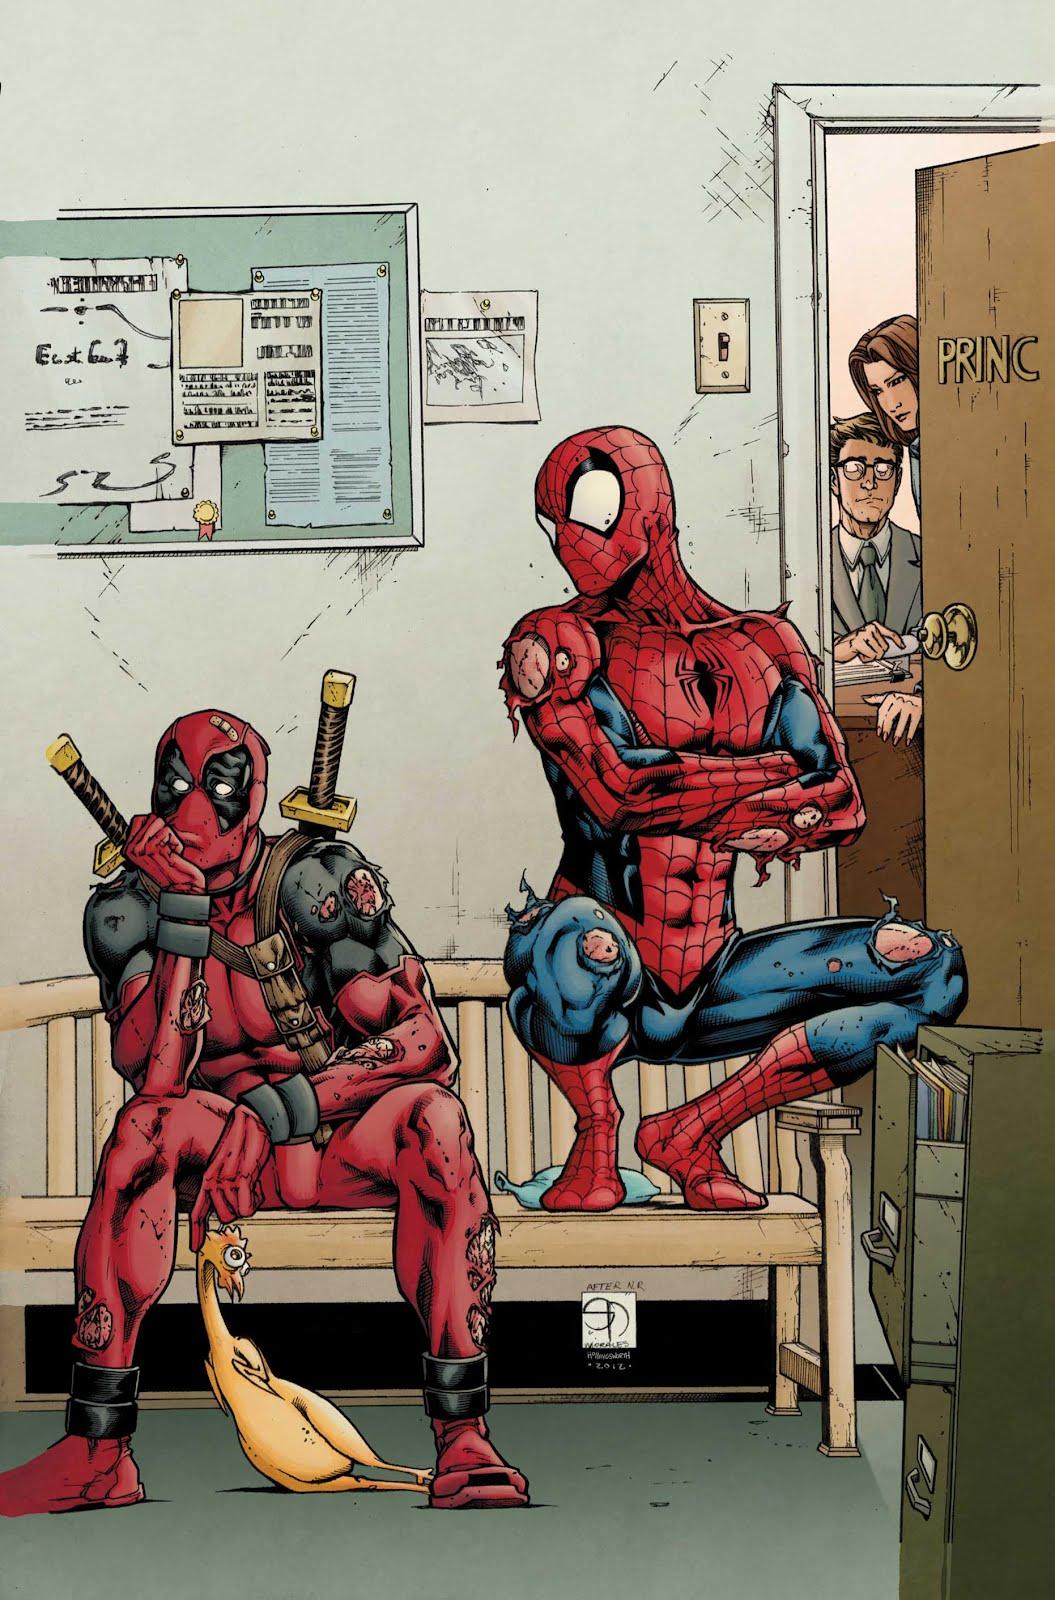 deadpool and spiderman comic - photo #3